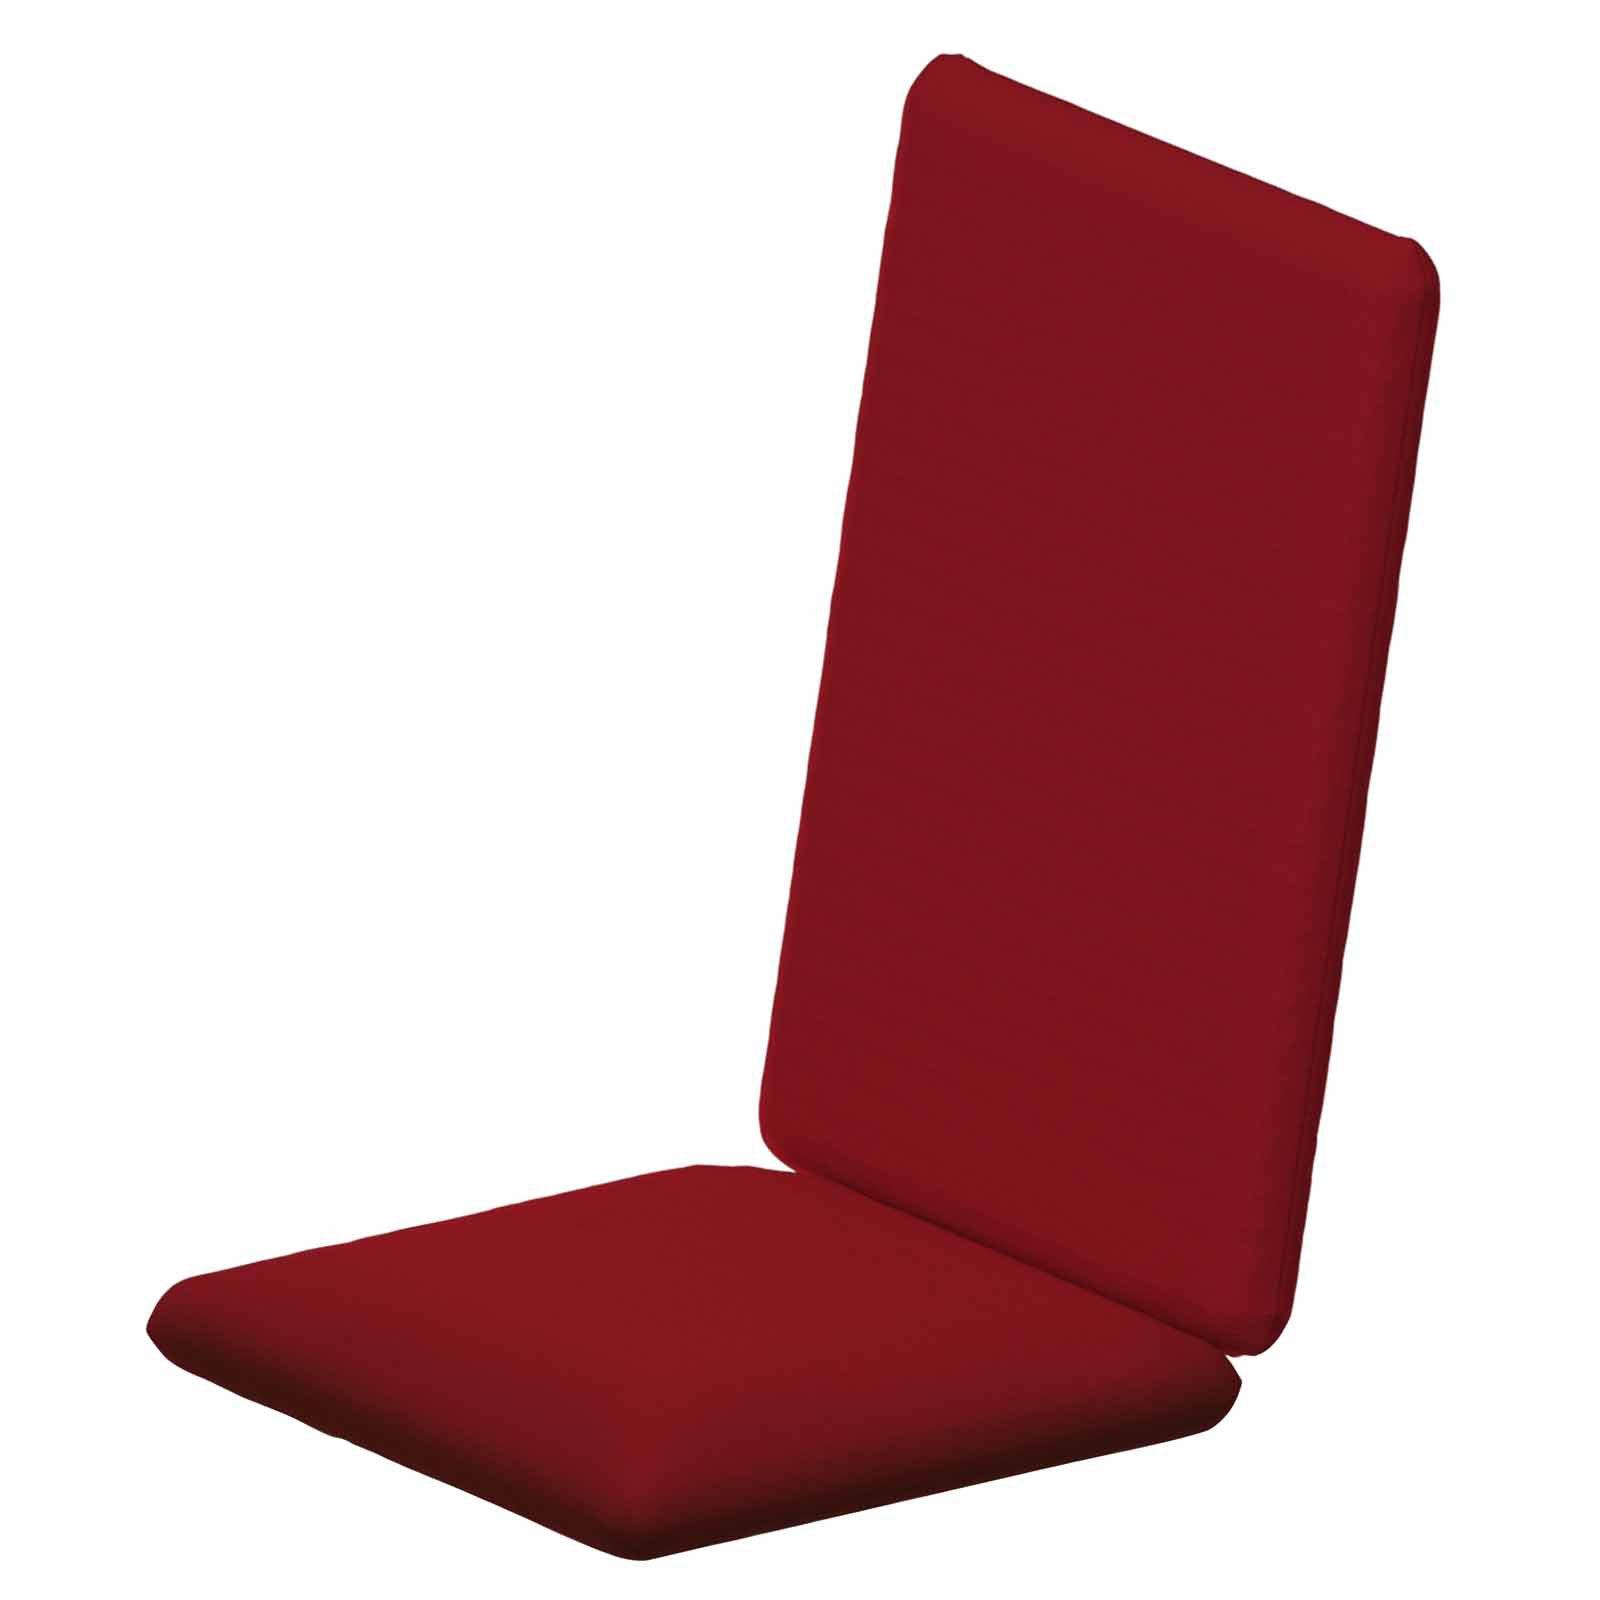 POLYWOOD® Sunbrella 39.5 x 17.25 in. Hinged Dining Chair Cushion